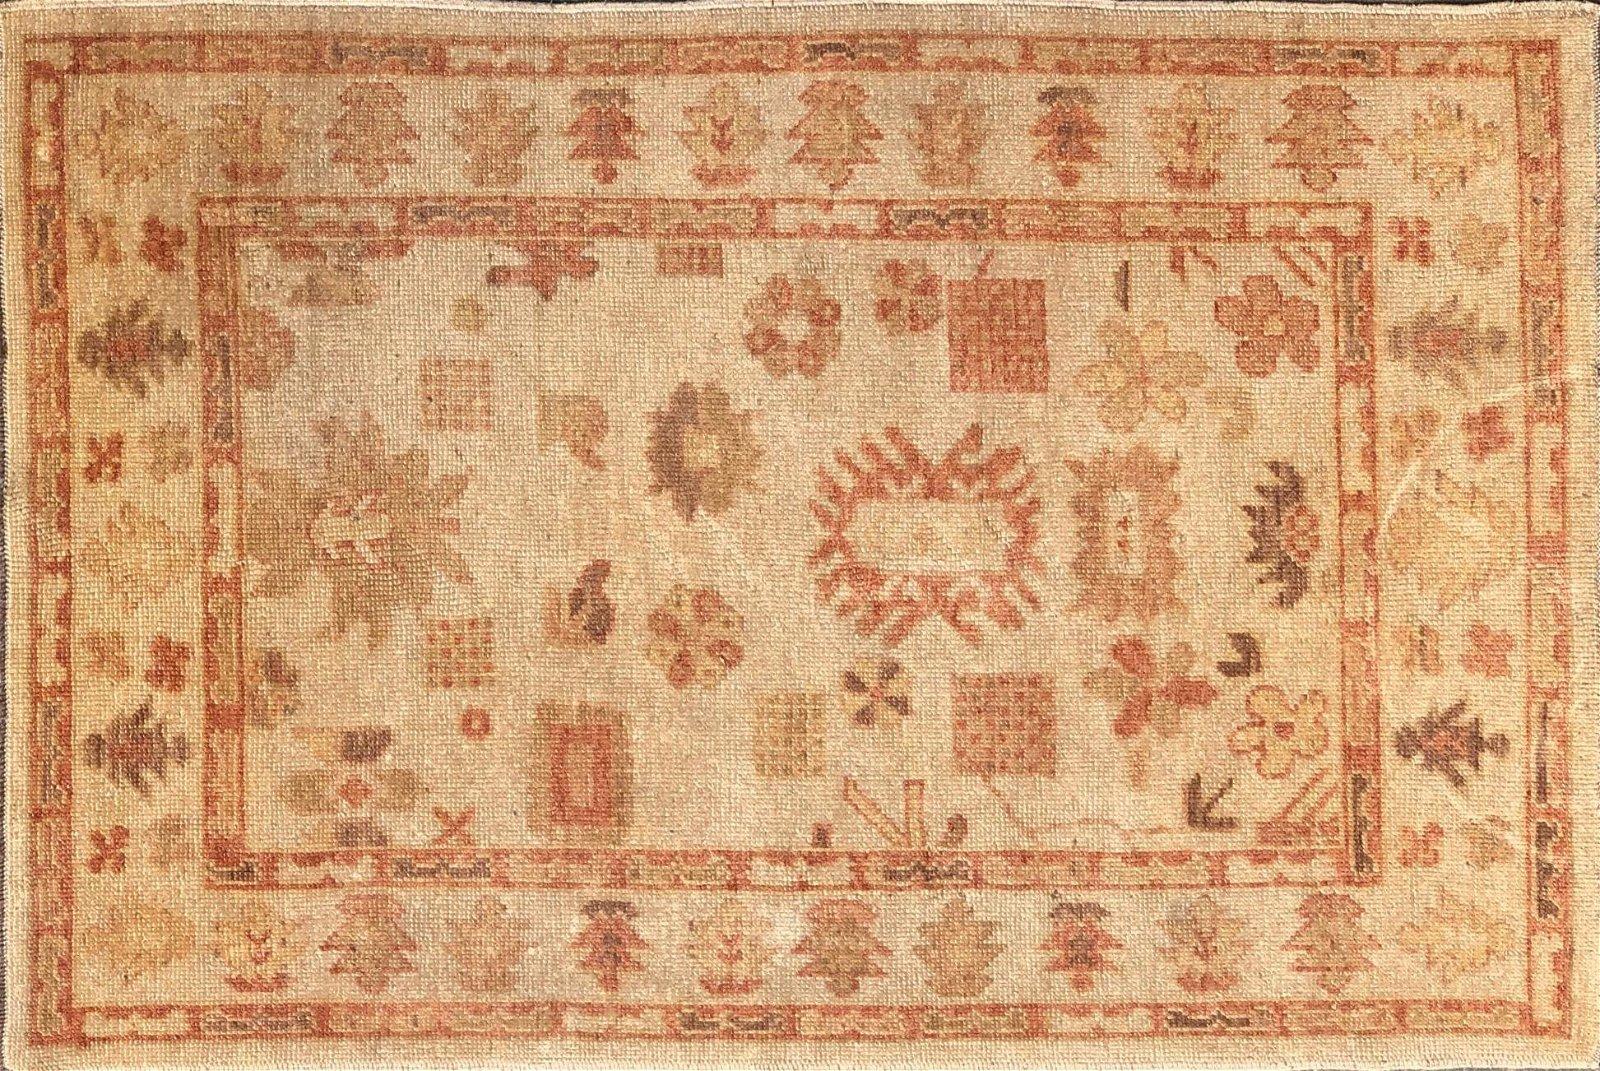 Vintage Hand Woven Turkish Oushak Carpet